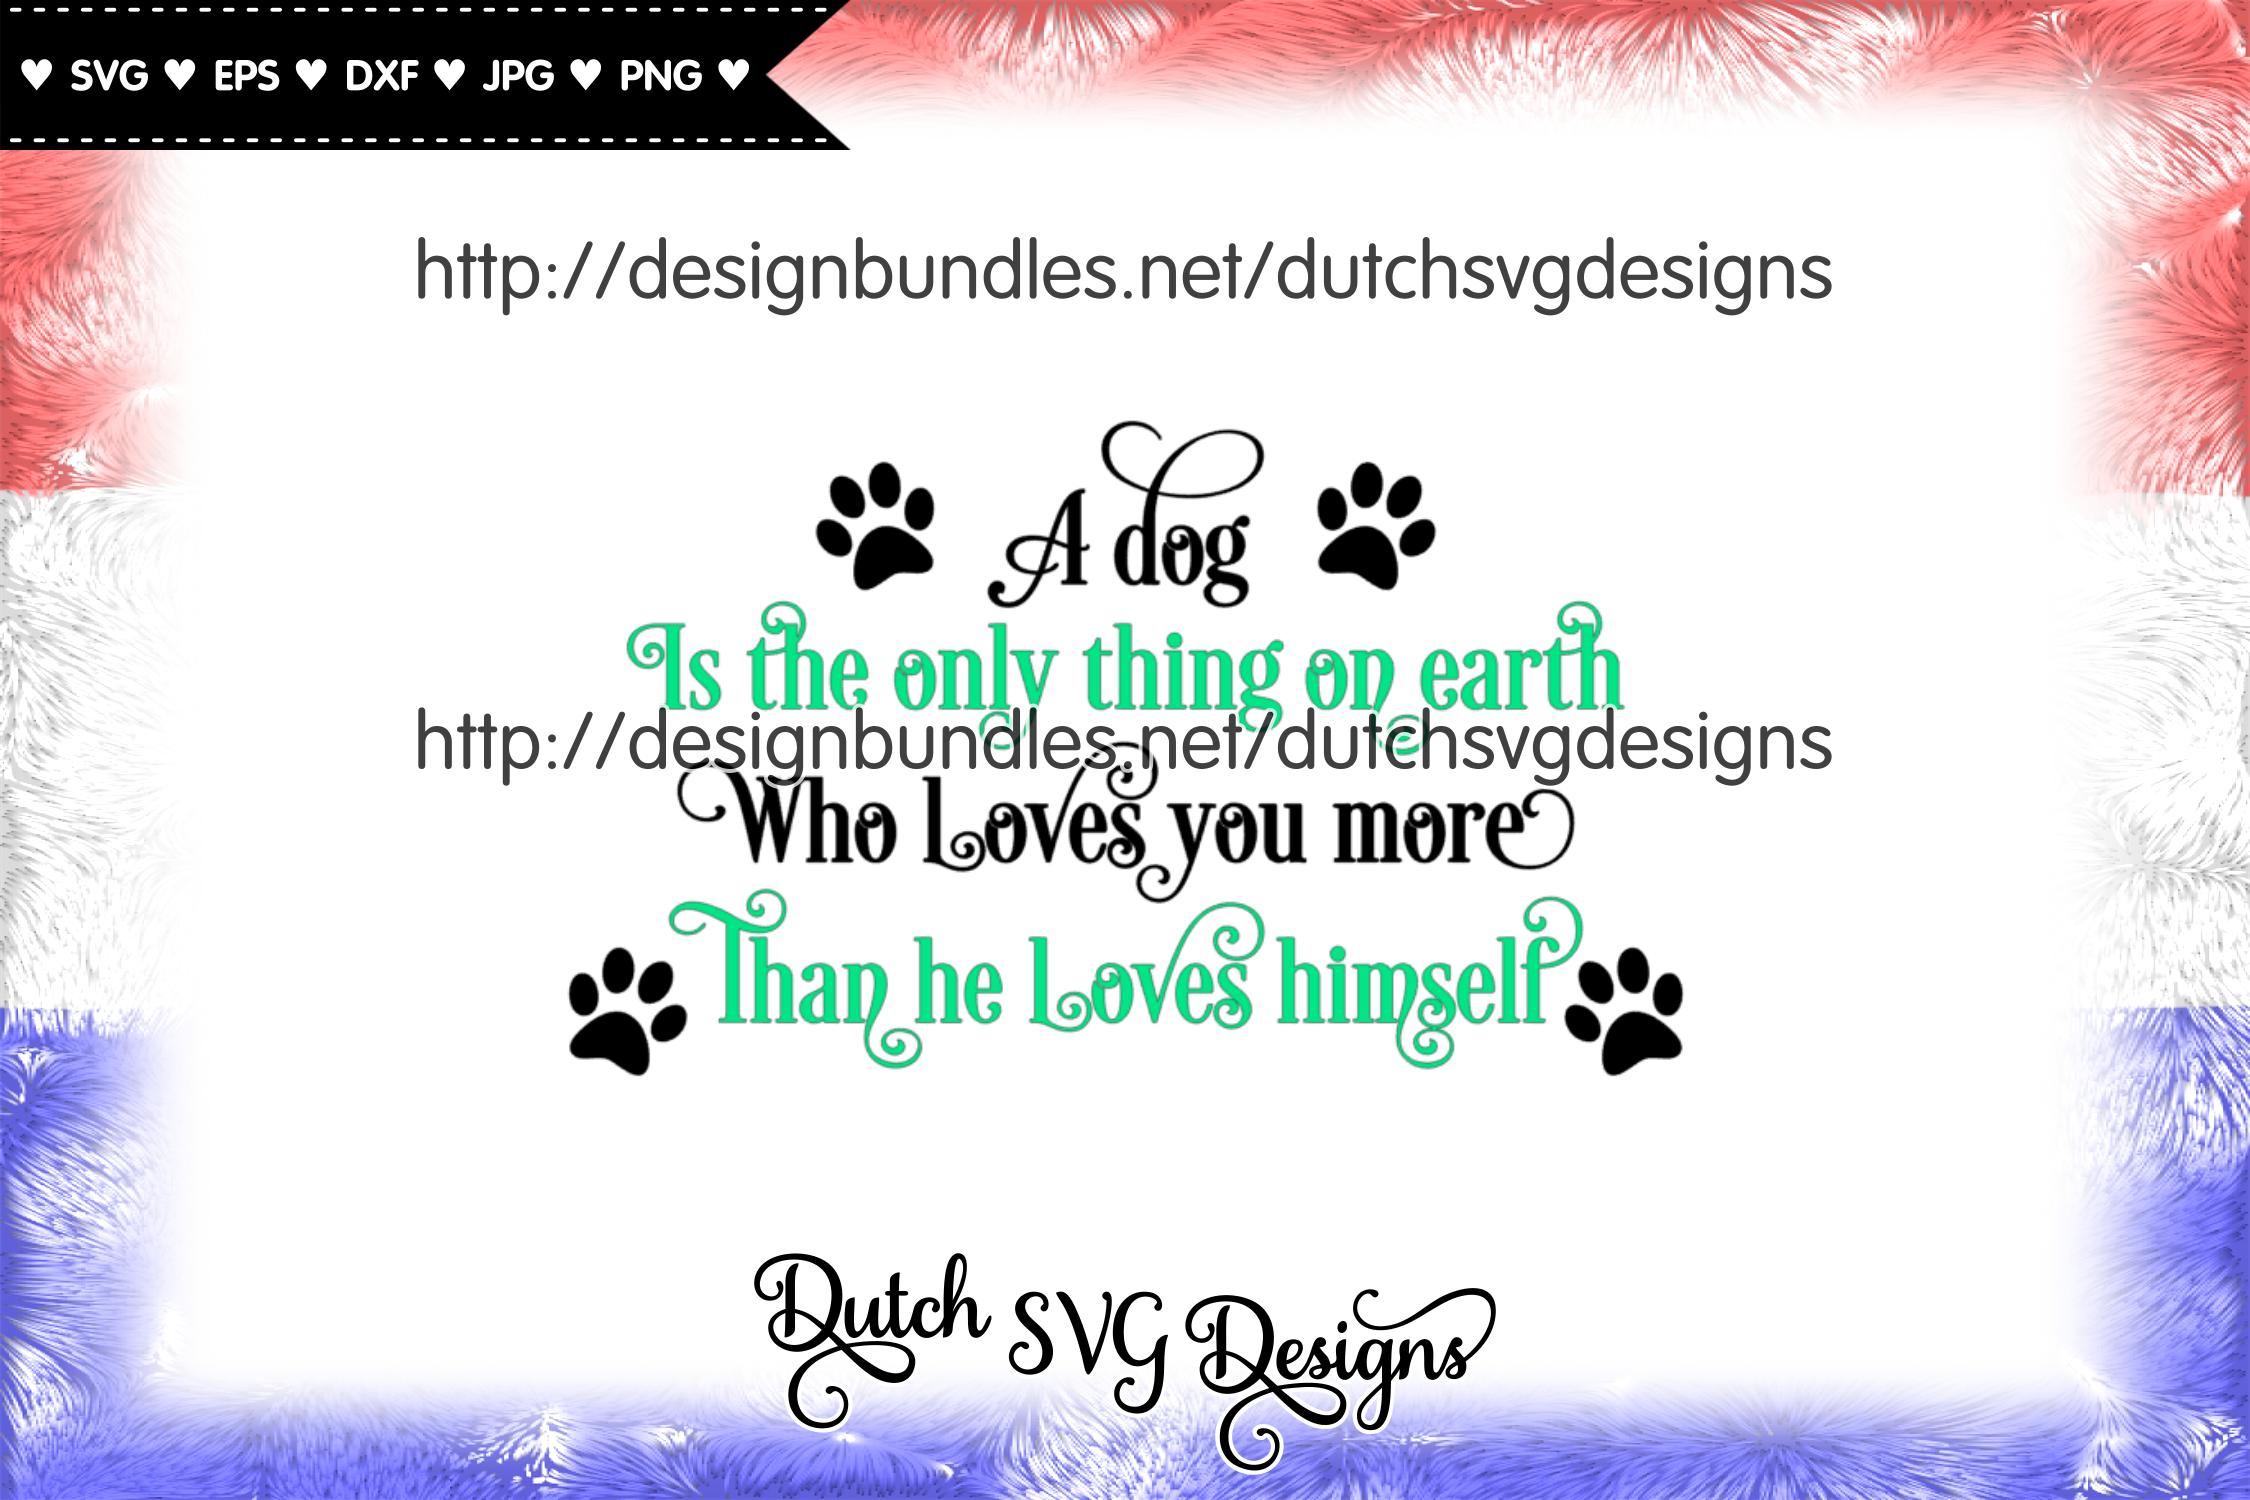 Dog text cut file, dog svg, dog cutting file, dog cut file example image 3